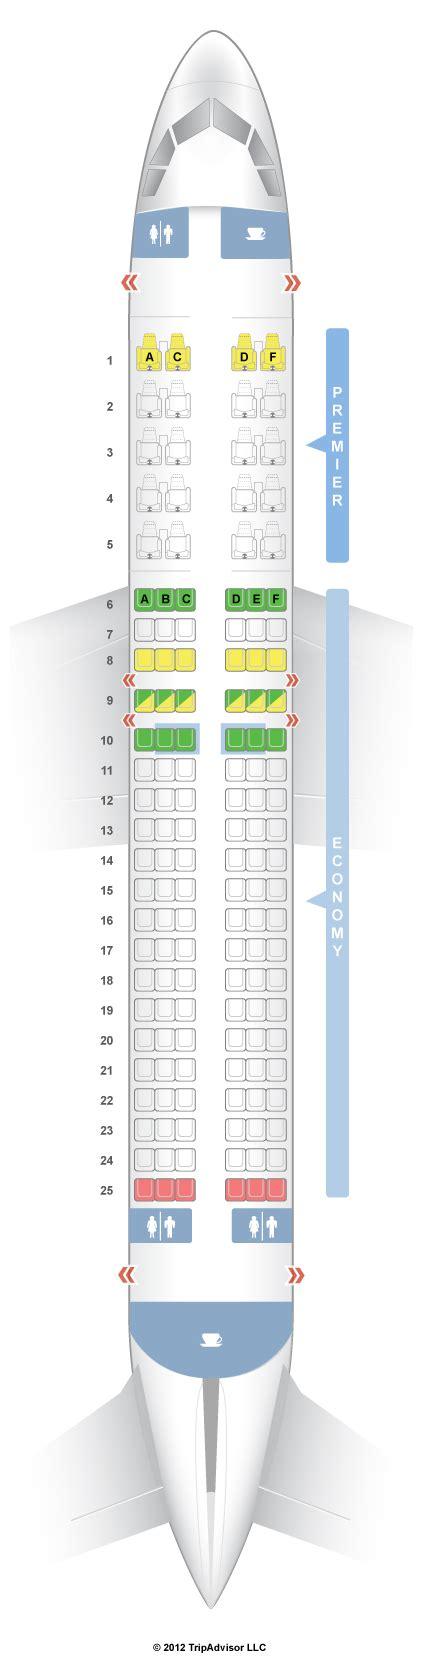 air cubana reservation siege seatguru seat map aeroflot airbus a320 320 v1